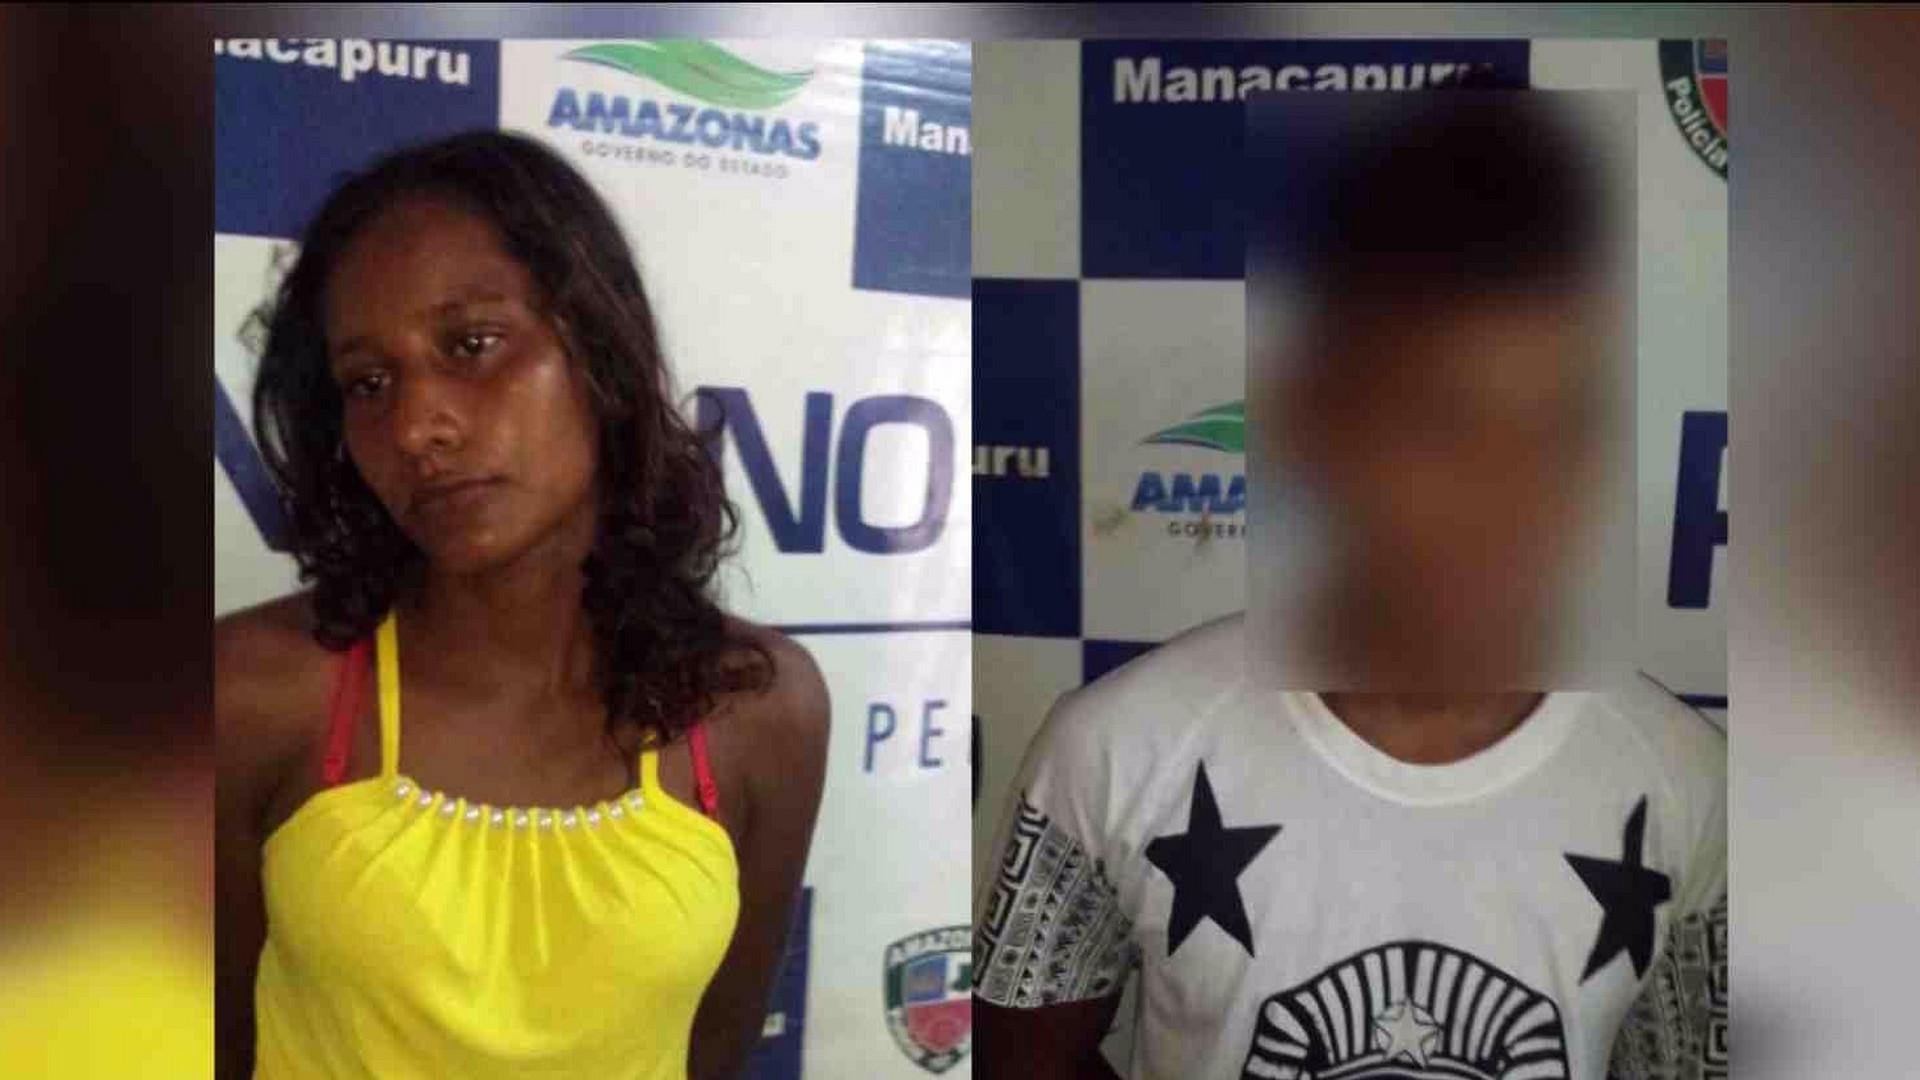 PESCADOR É ENCONTRADO MORTO EM TERRENO BALDIO - Alô Amazonas - 14/08/17